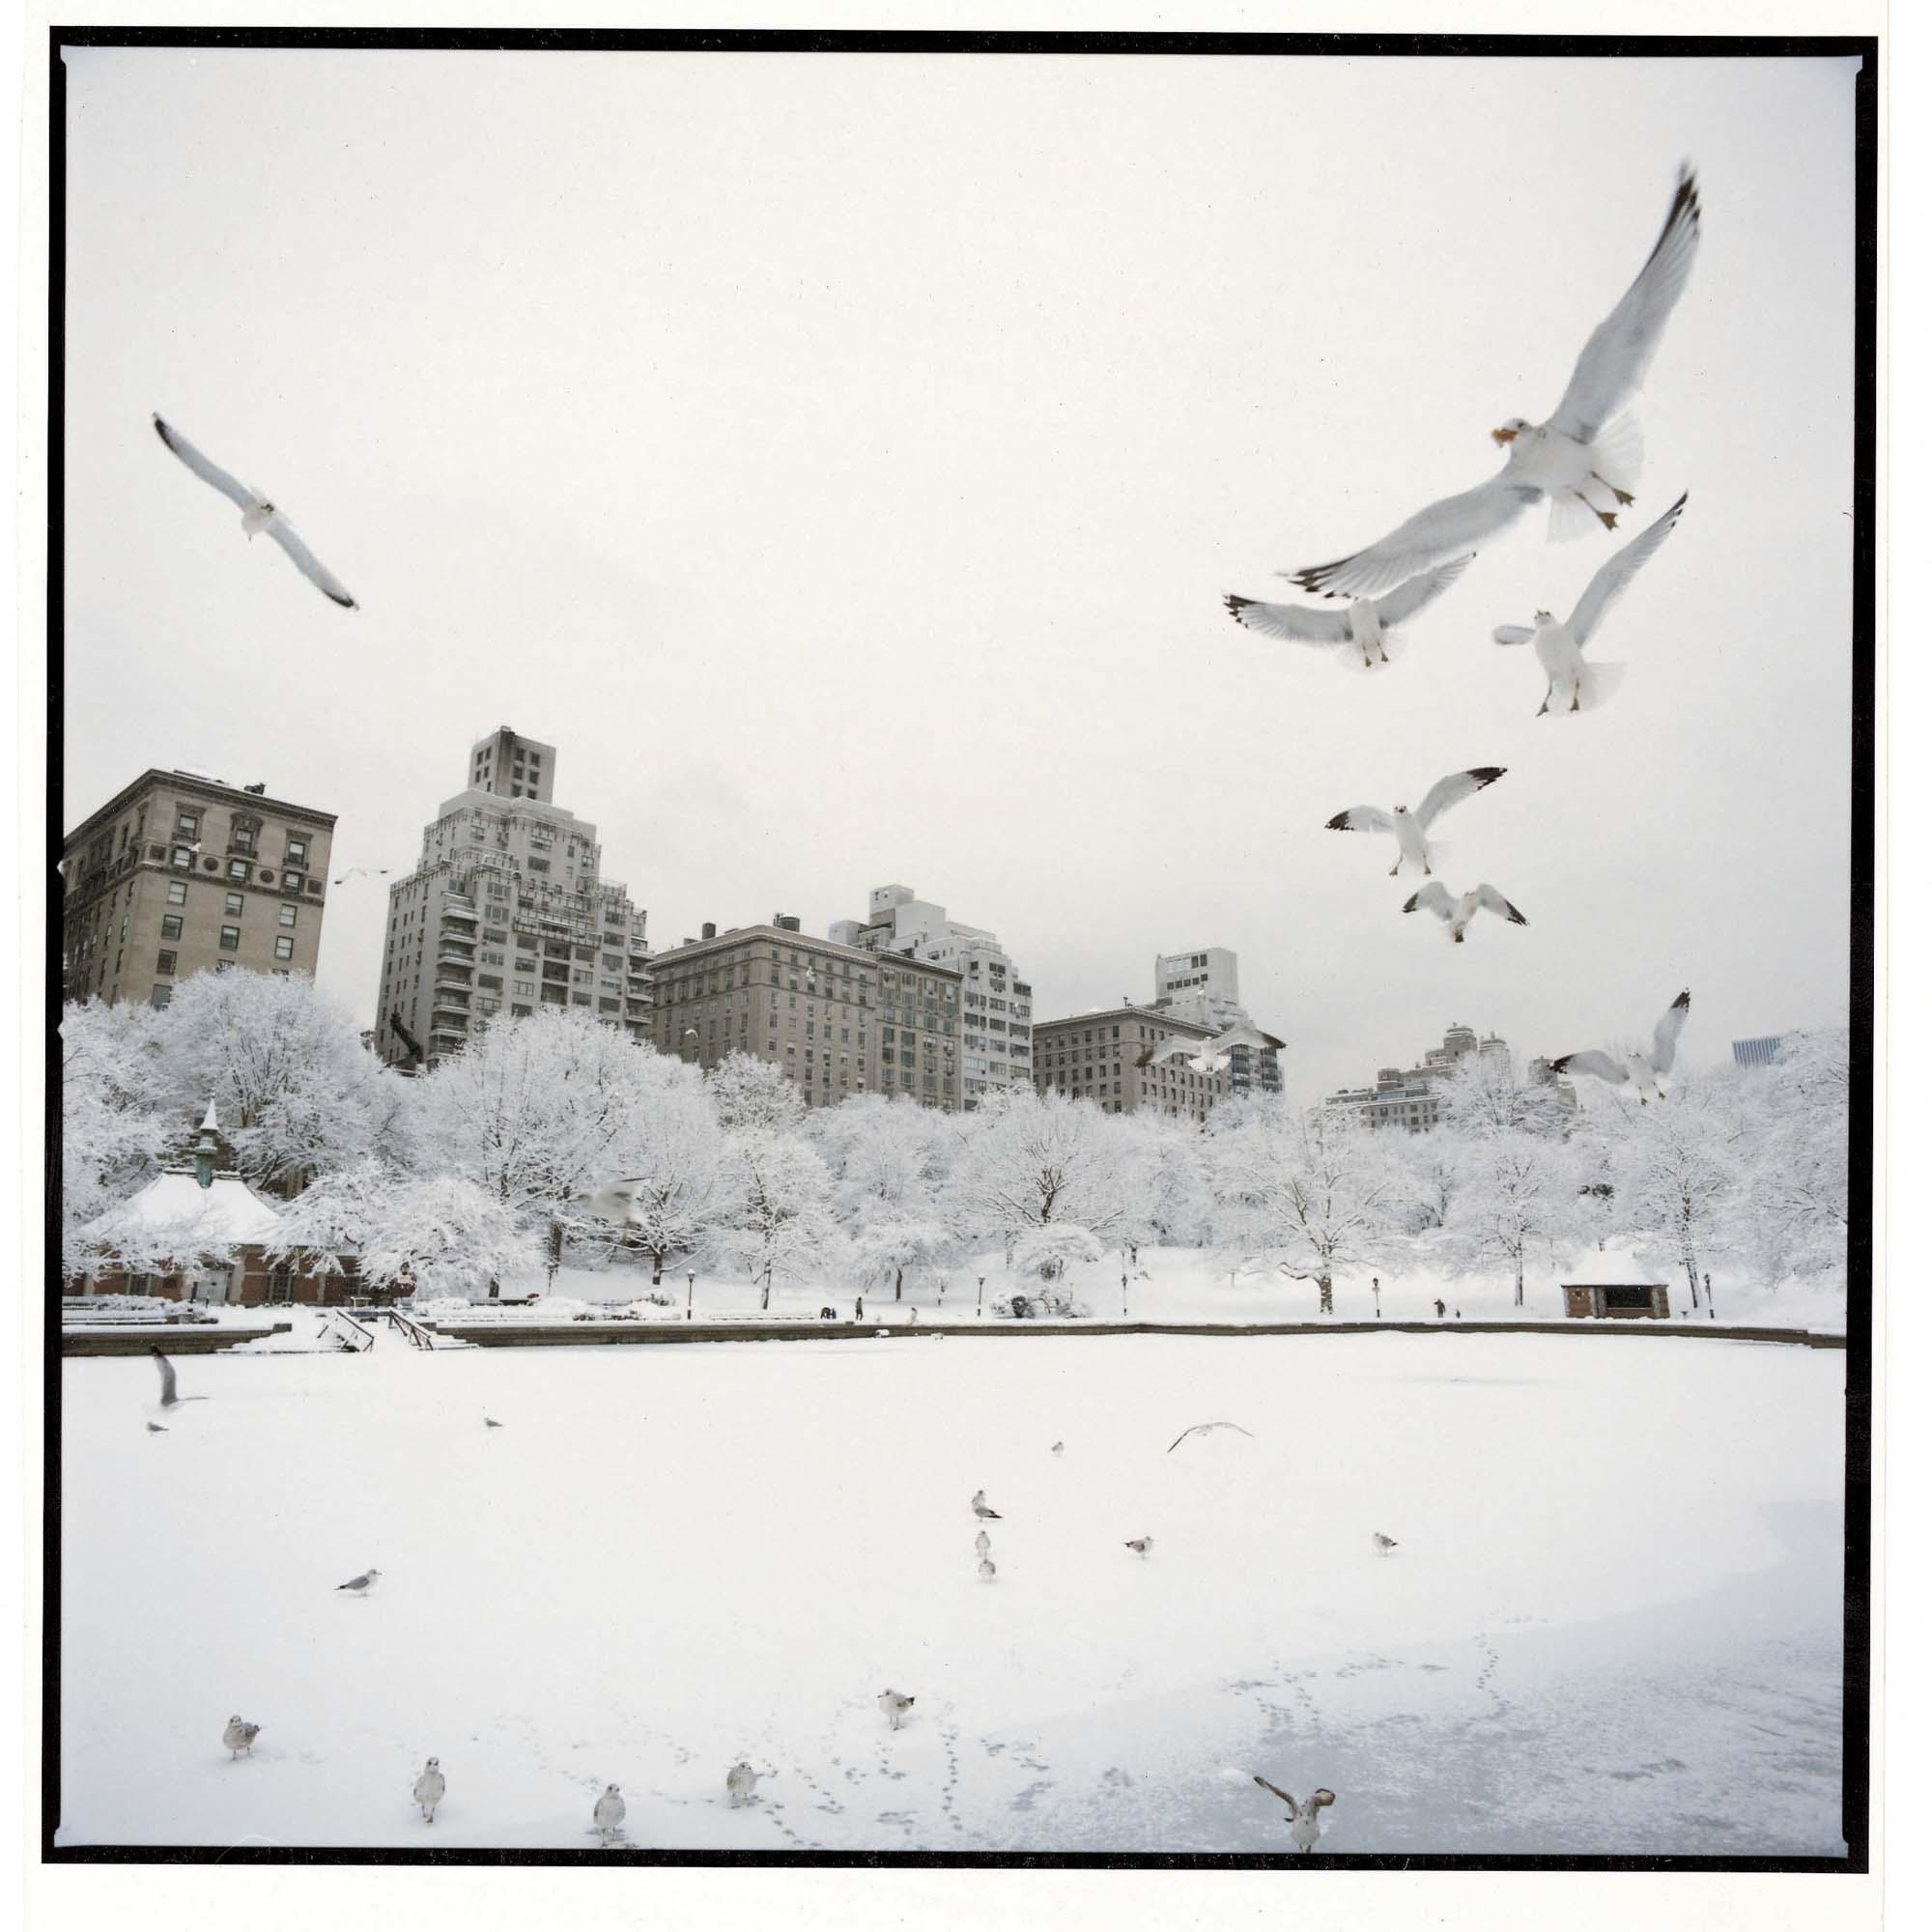 WilliamHeydt-Photographs-c3437-13.jpg